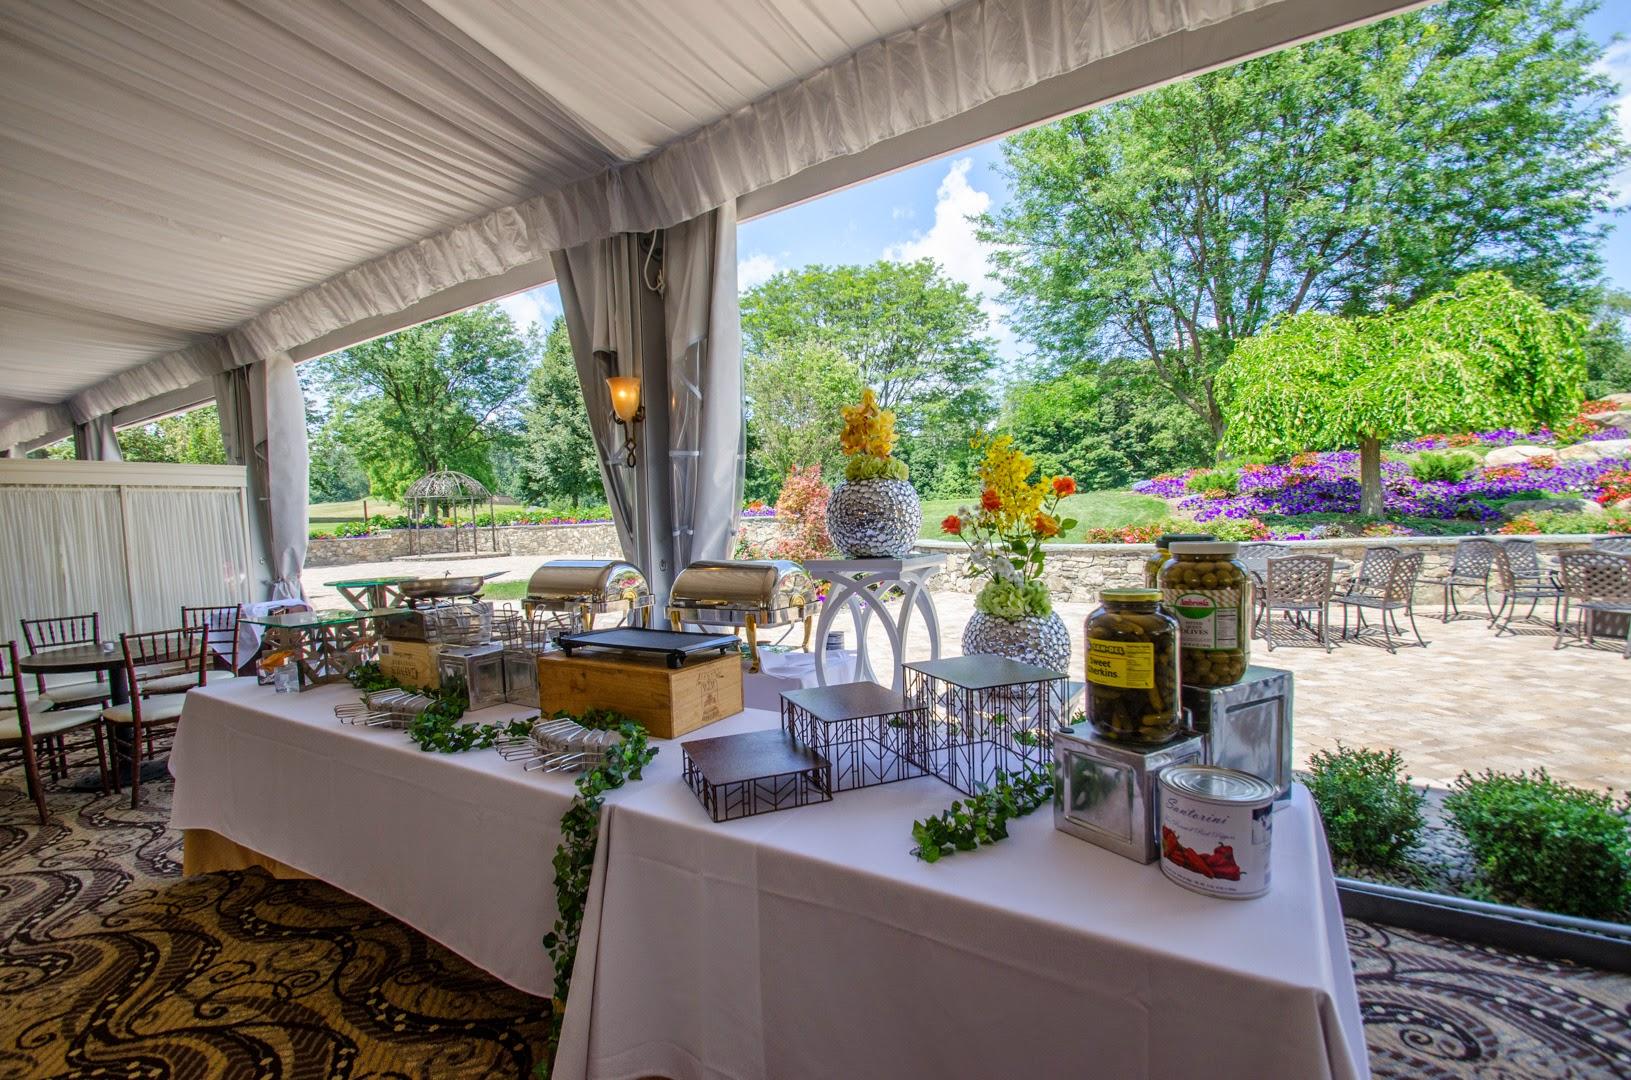 Ballroom Outdoor Wedding Venue Jogja: West Hills Country Club